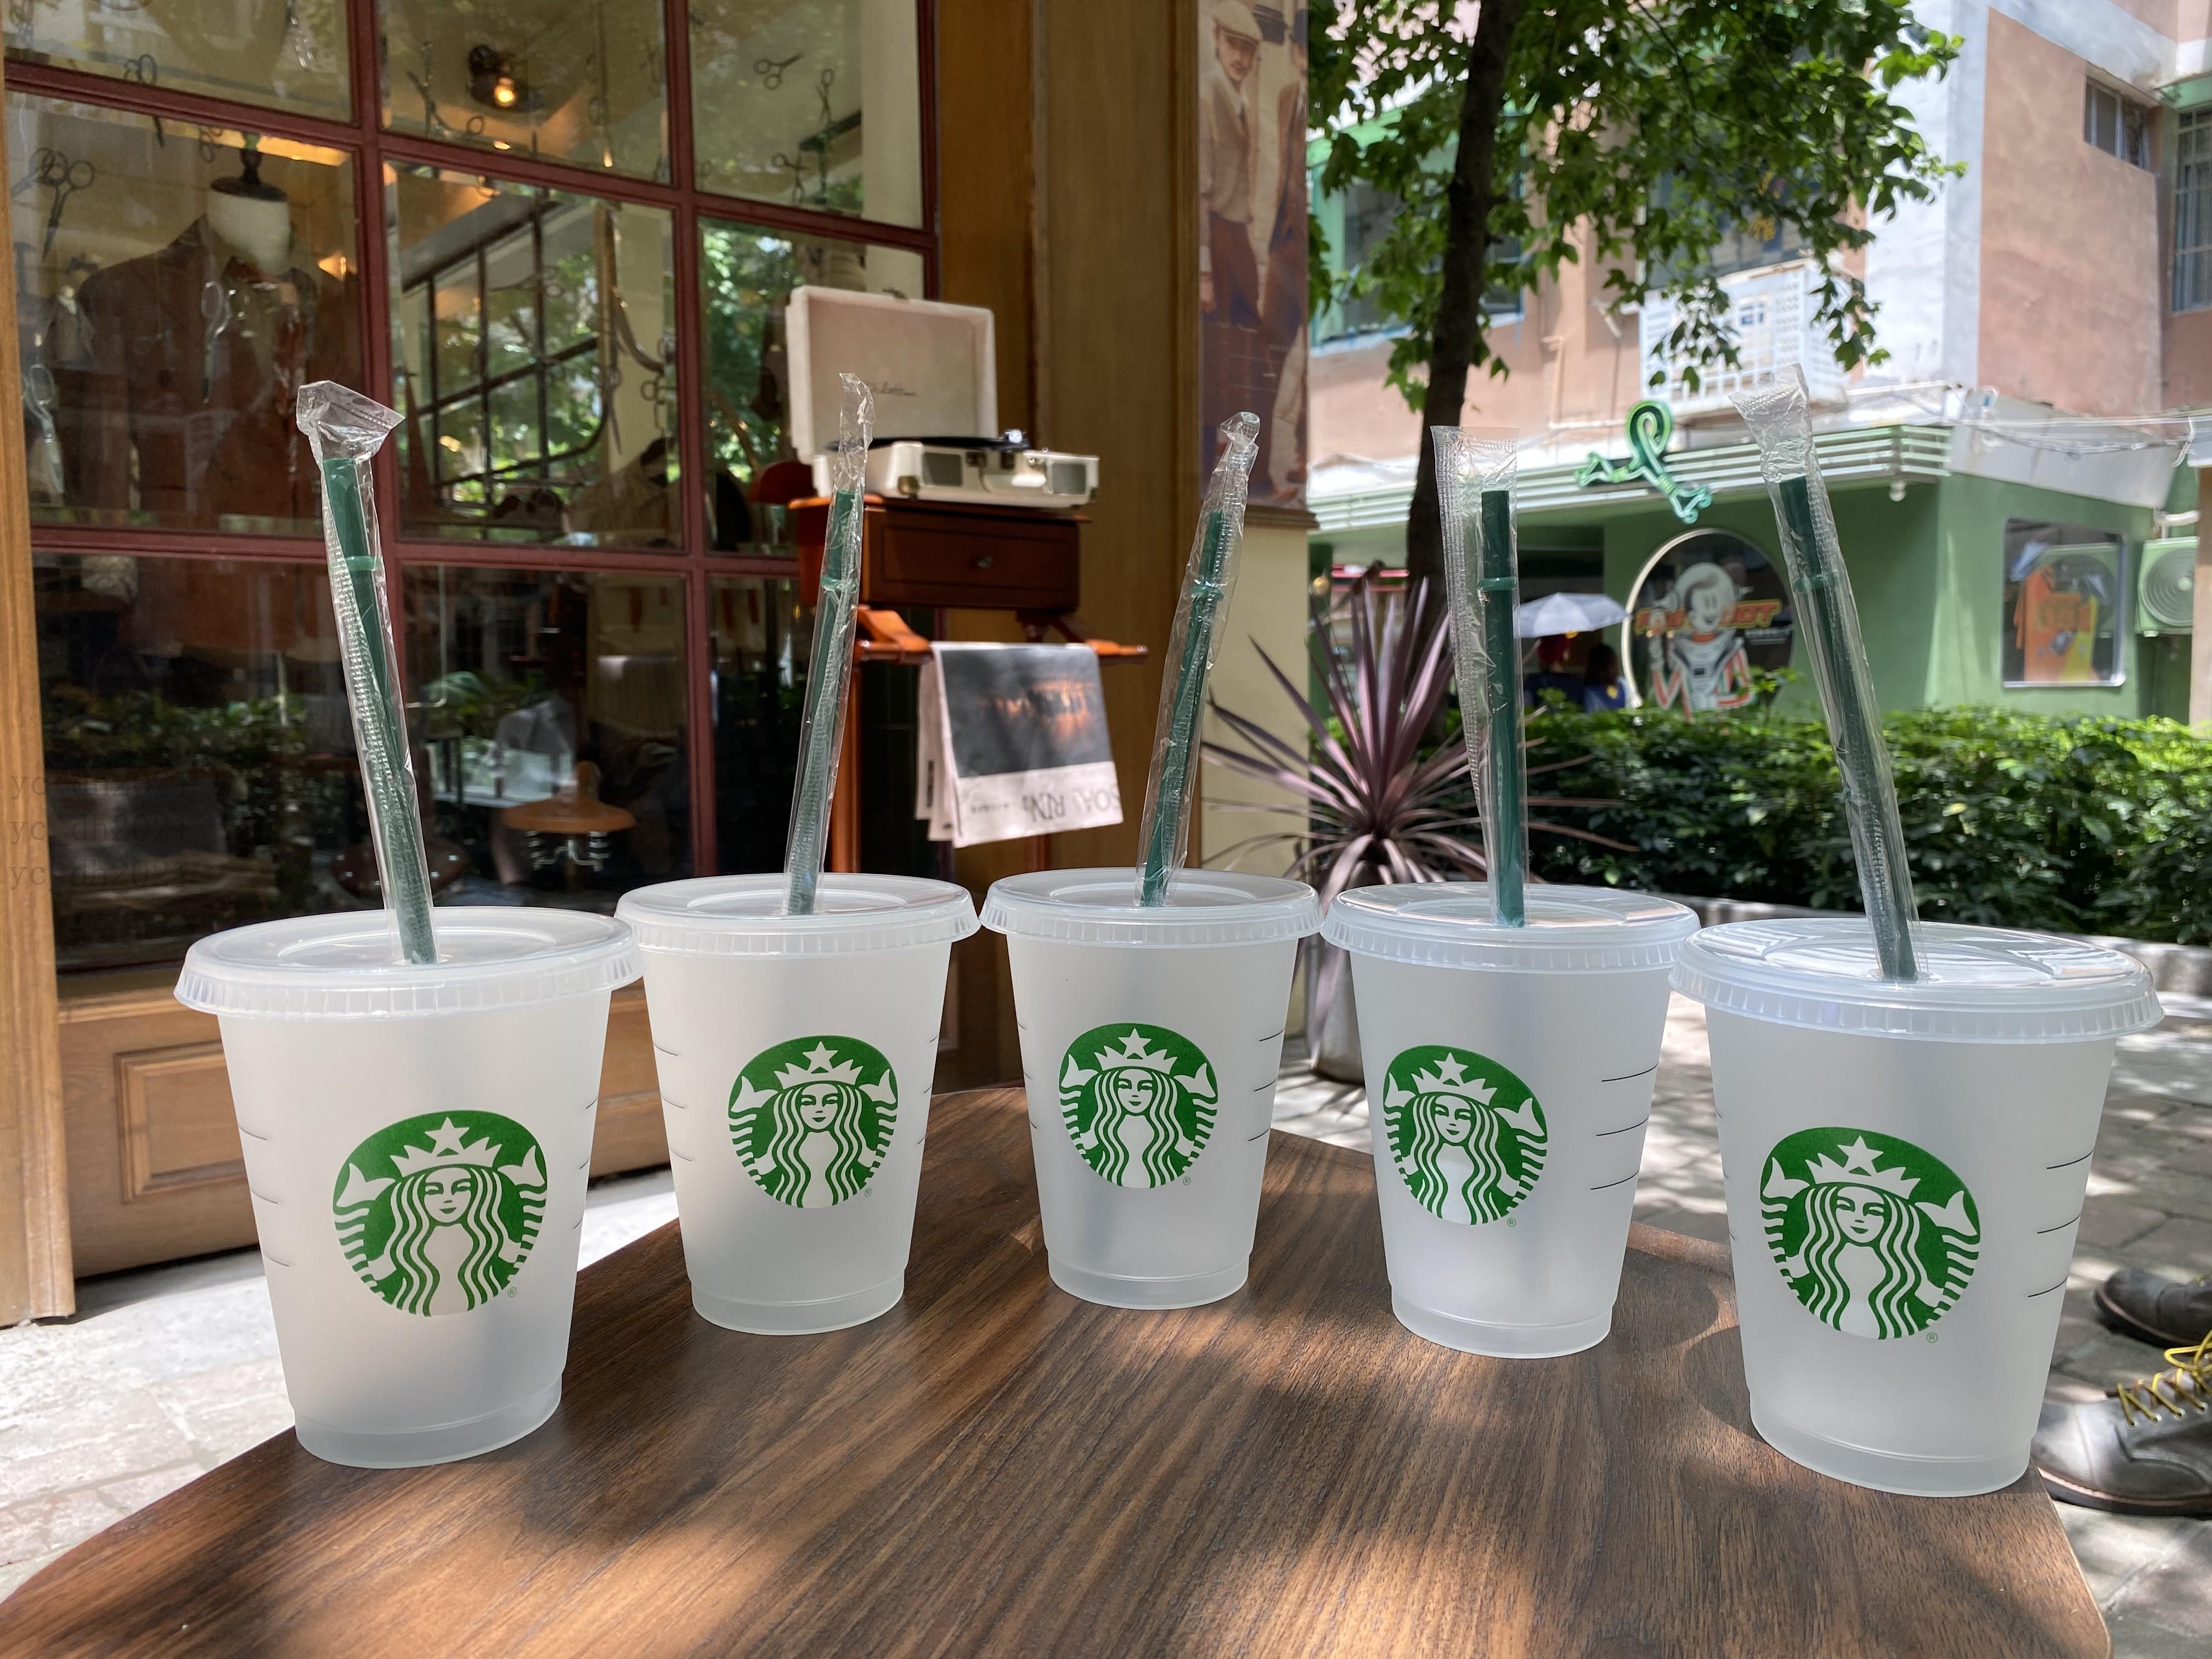 Starbucks 16 oz Tumblers Kupalar Plastik Dudak Ve Saman Sihirli Kahve Kupa Kostom Şeffaf Bardaklar Ile İçme Suyu Ücretsiz DHL